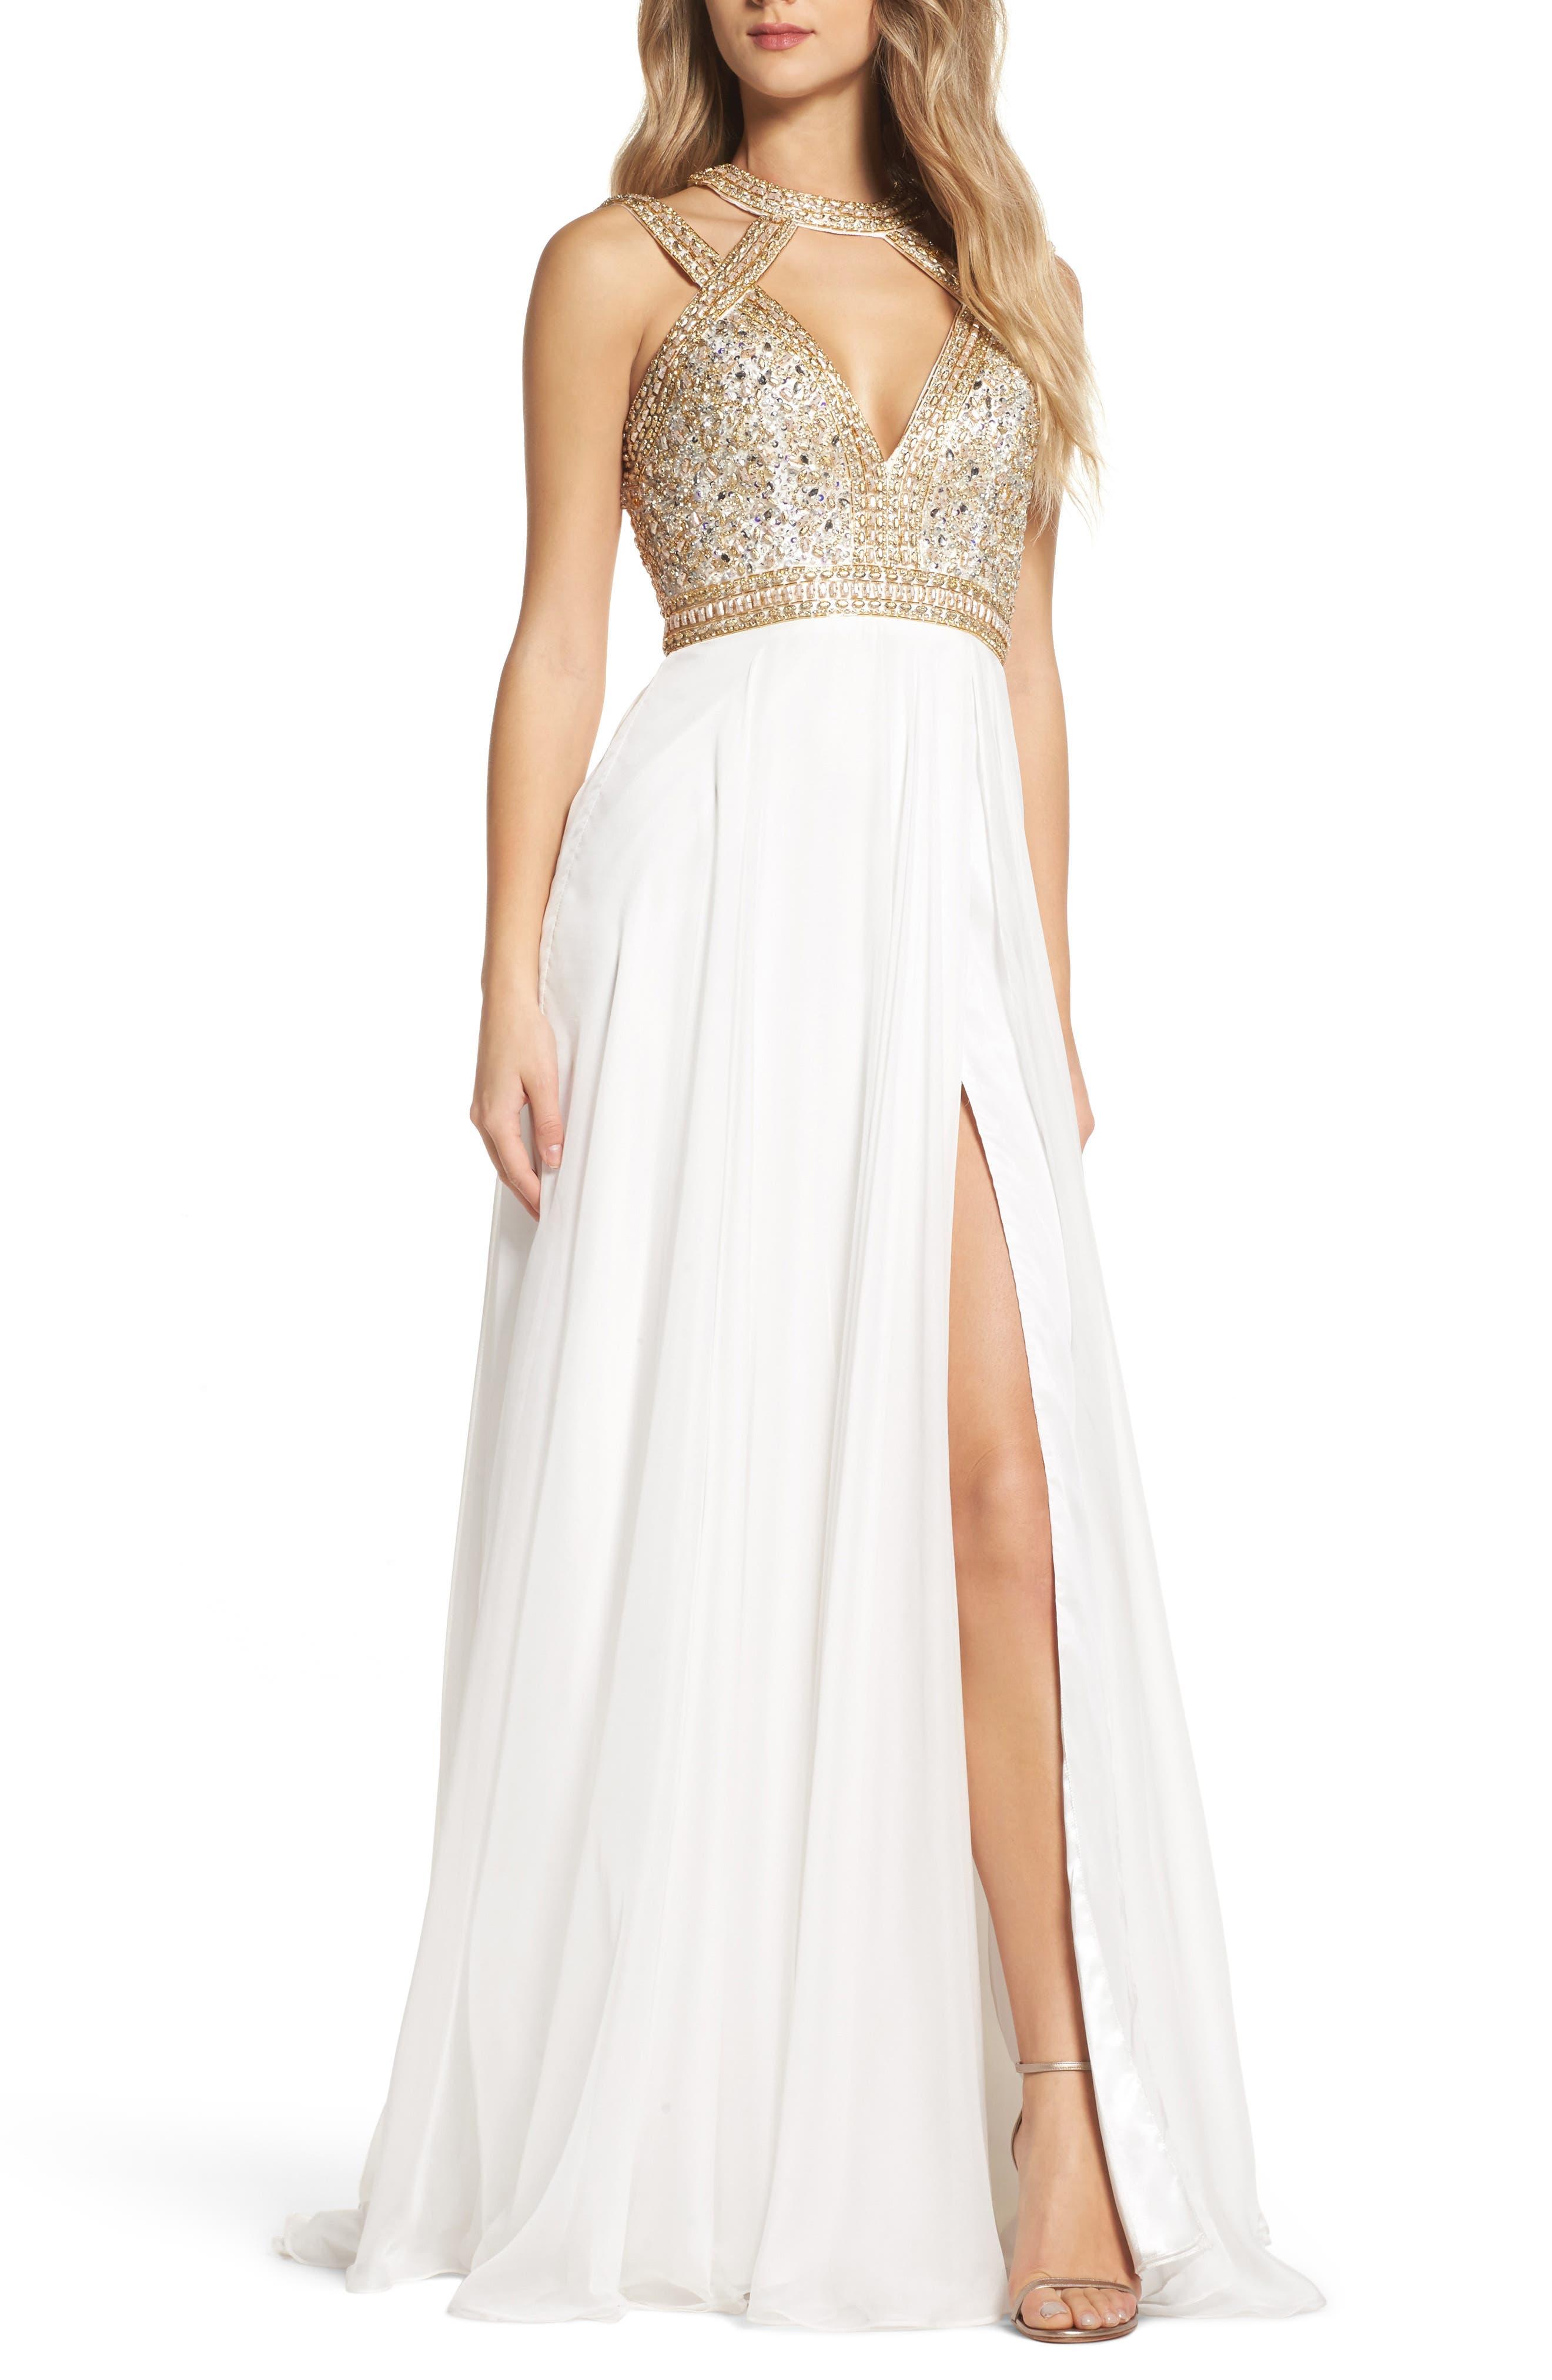 Main Image - Mac Duggal Beaded Cutout Bodice Gown